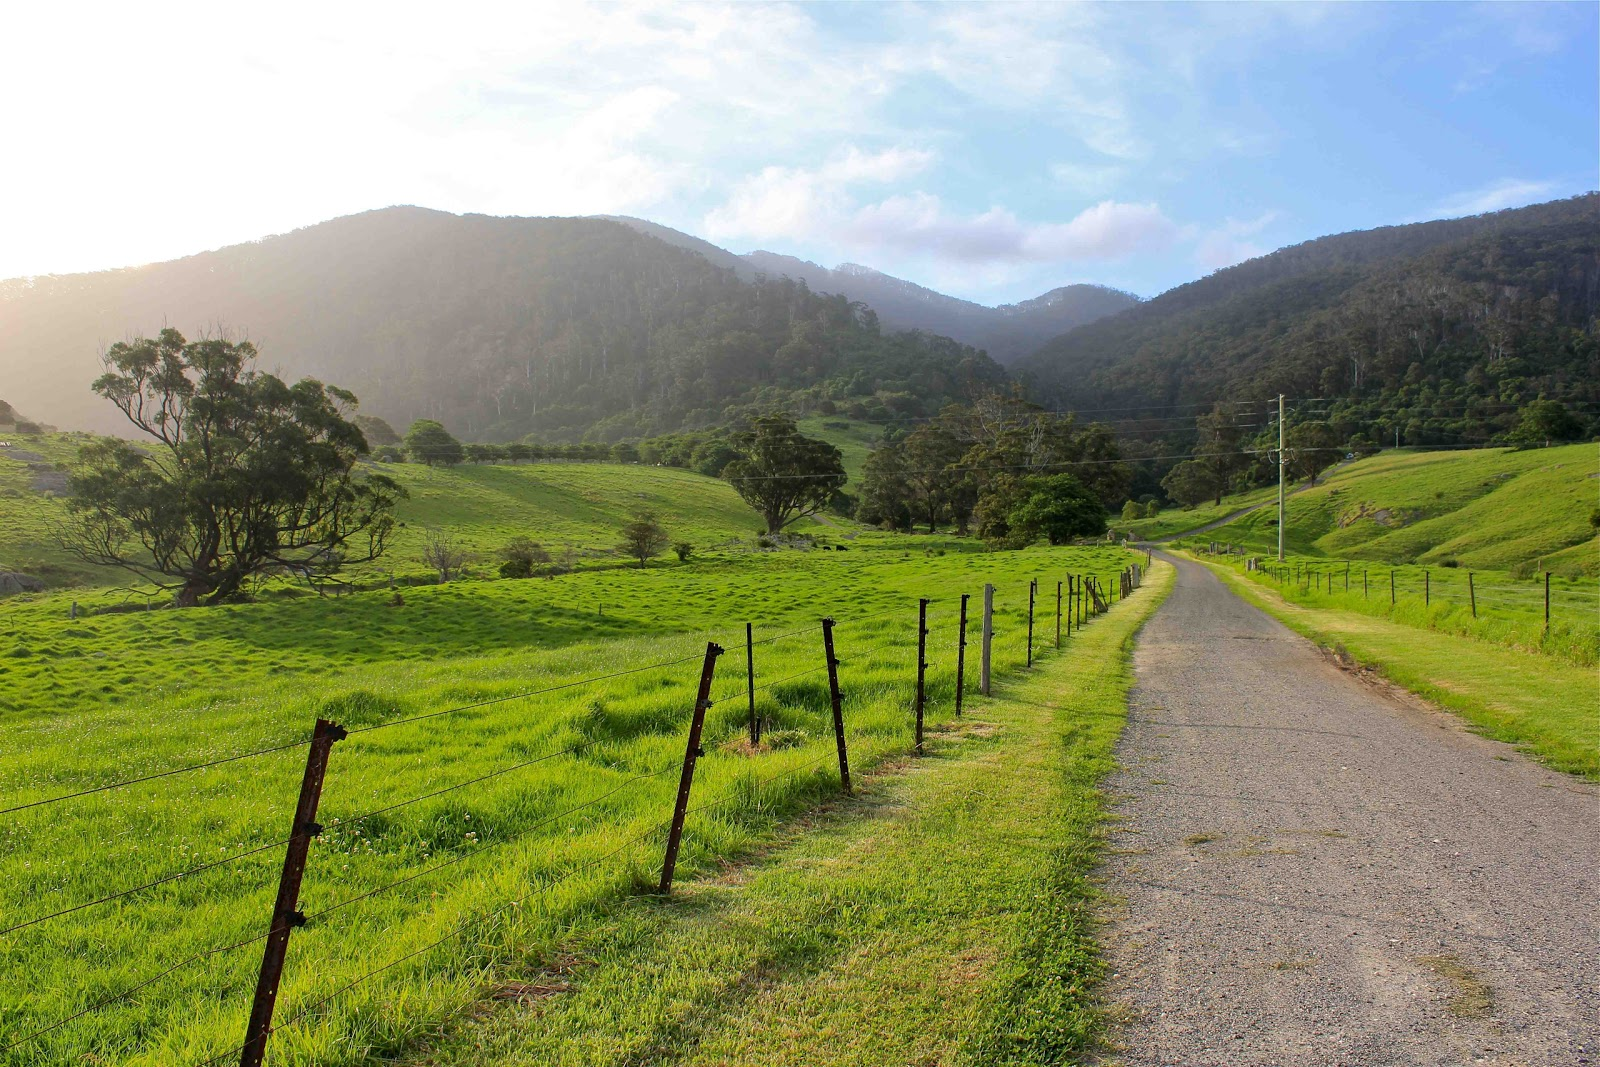 Tilba Tilba Australia  city photos gallery : Posted by Sarah at 7:54 PM Location: Tilba Tilba NSW 2546, Australia